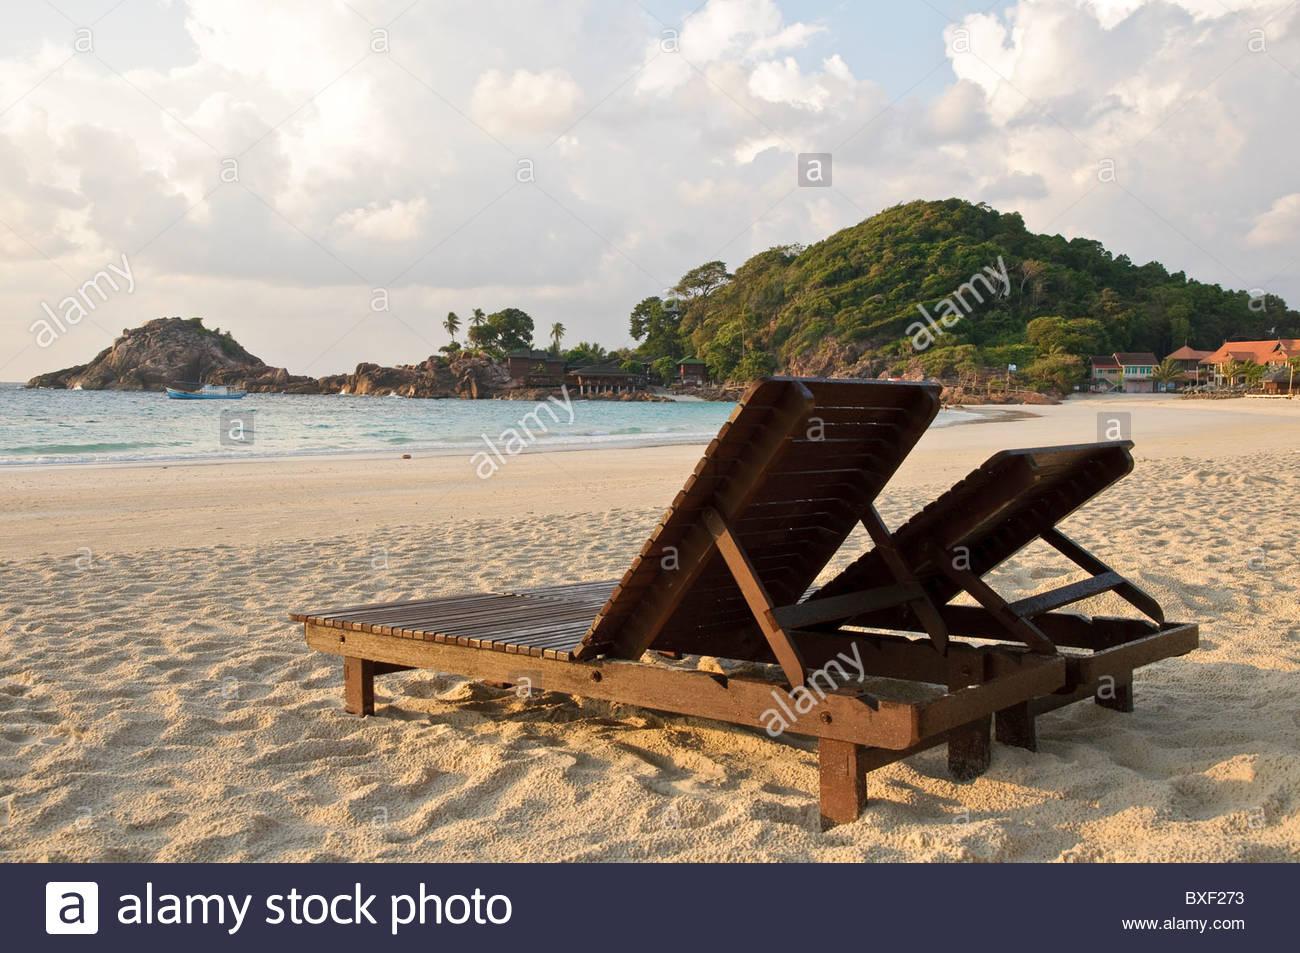 Beach with sun loungers in the morning, Pulau Redang island, Malaysia, Southeast Asia, Asia Stock Photo